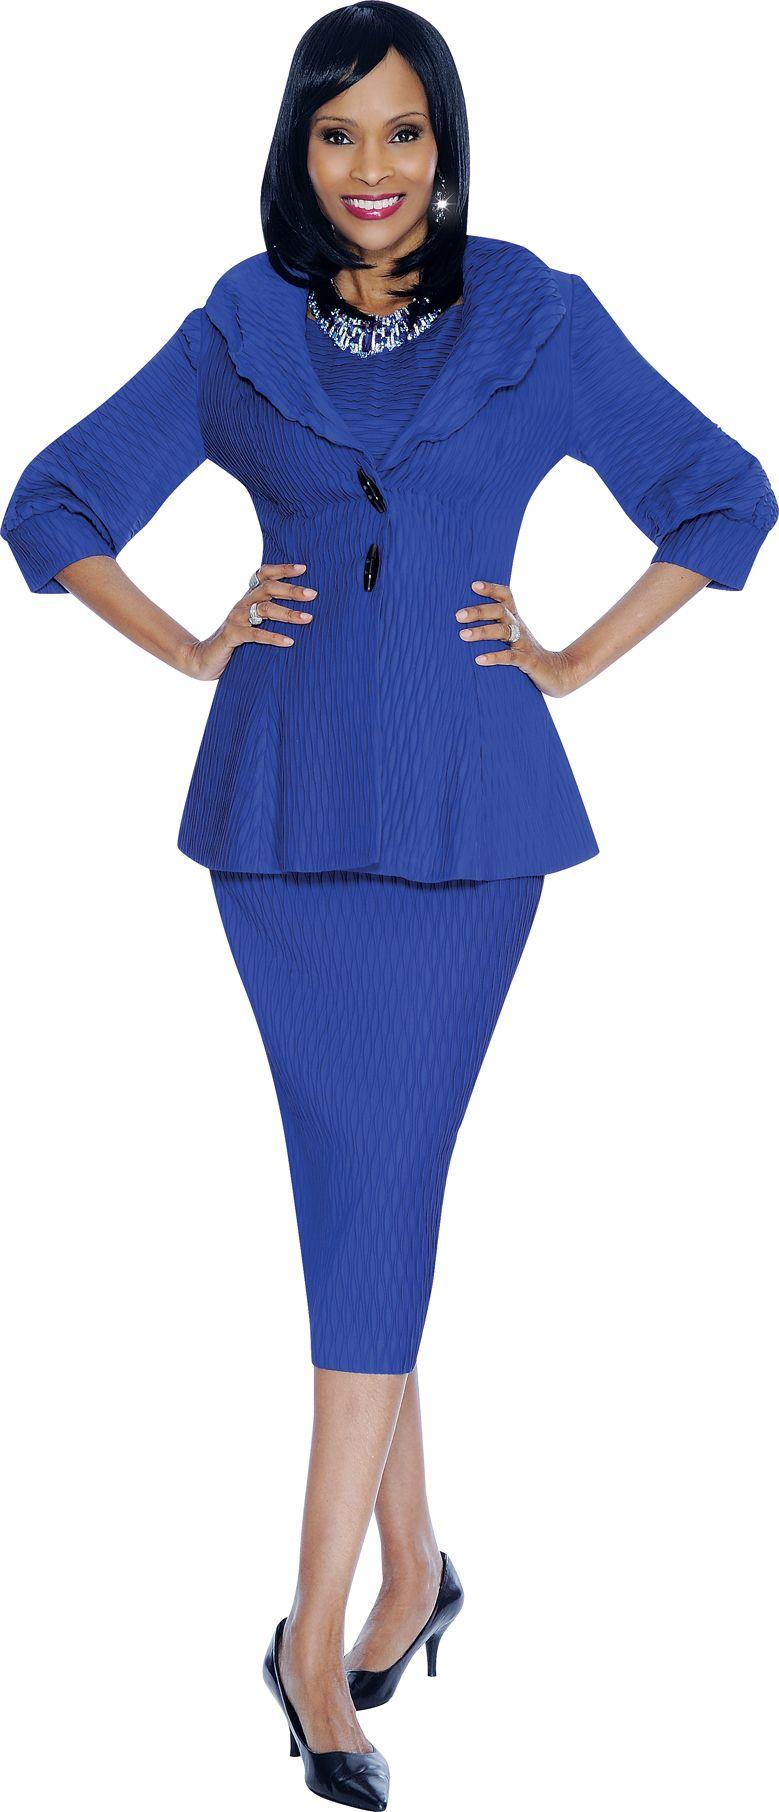 Terramina 7462 Womens 3pc Church Suit French Novelty